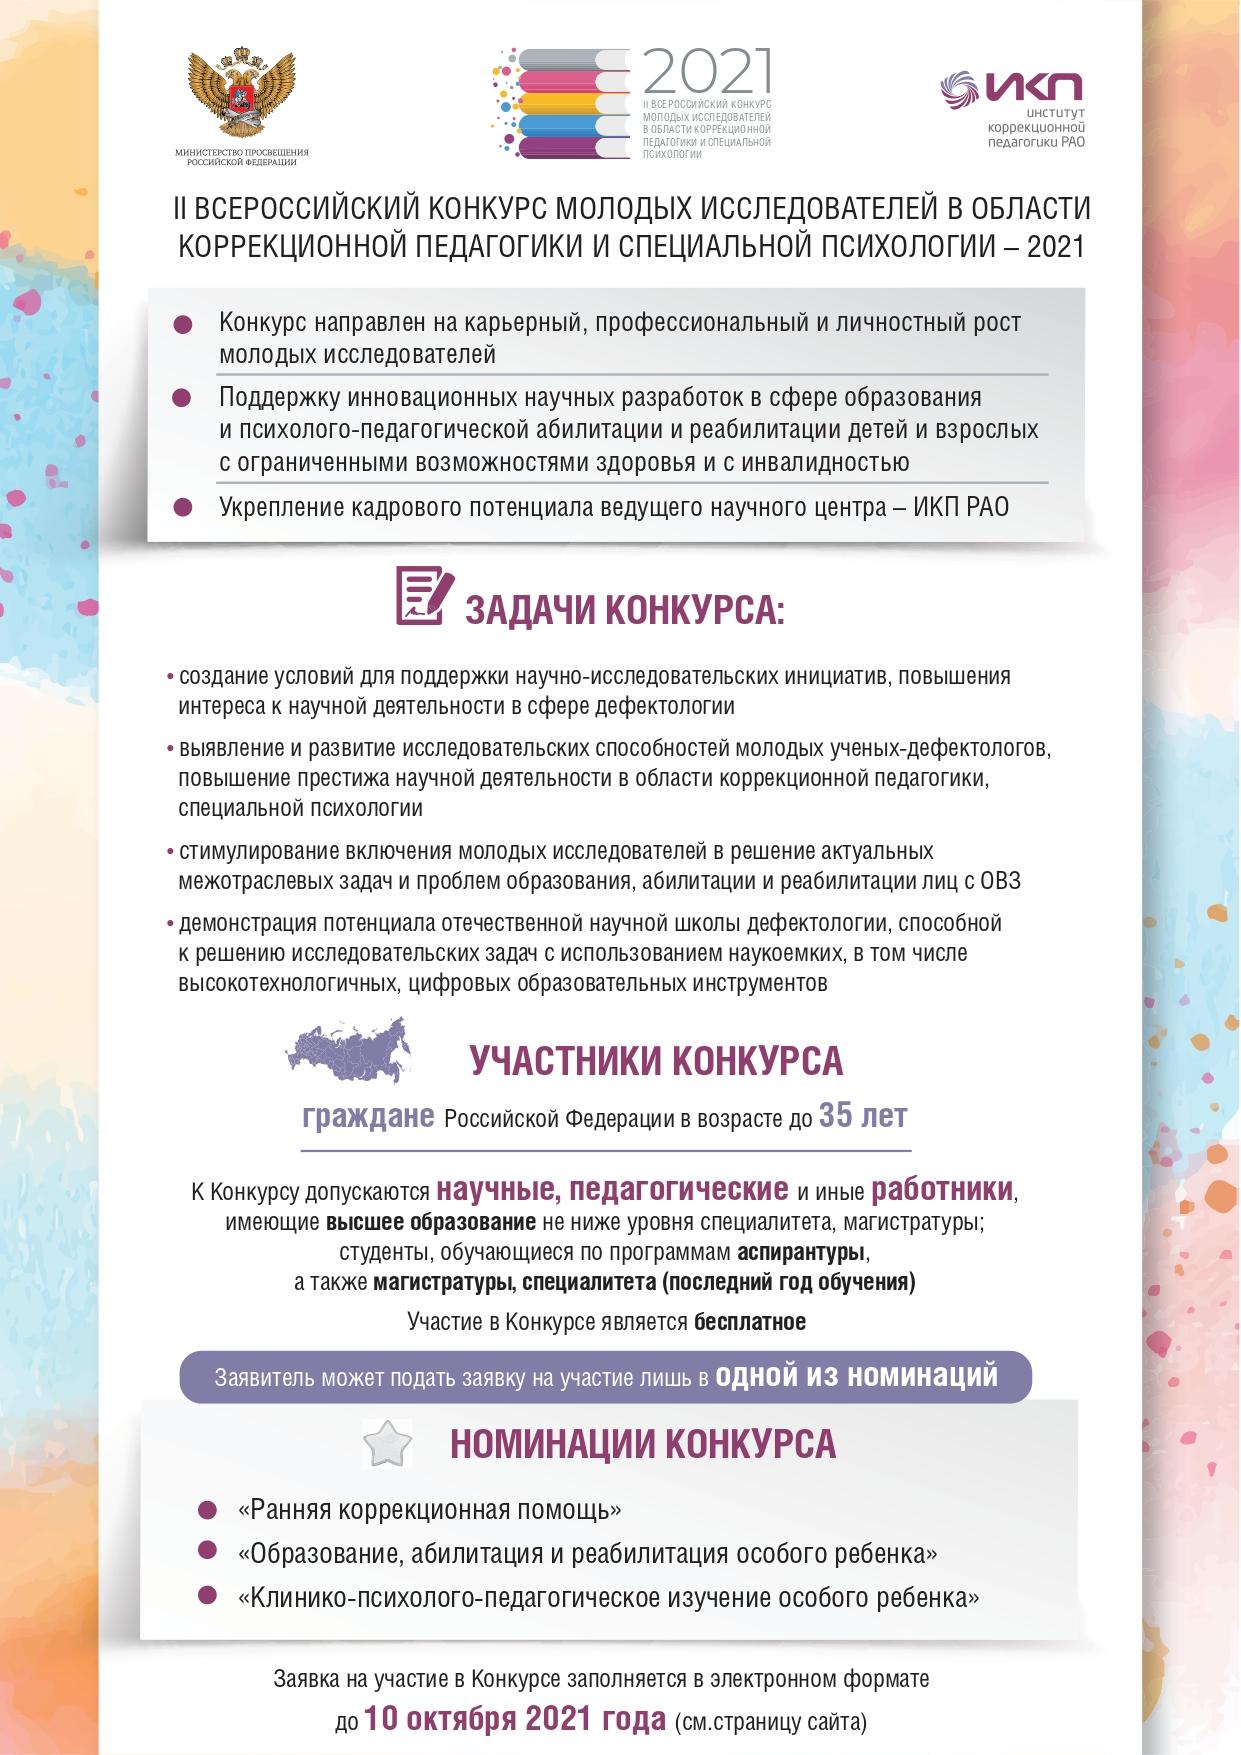 инфографика 2 конкурс_page-0001